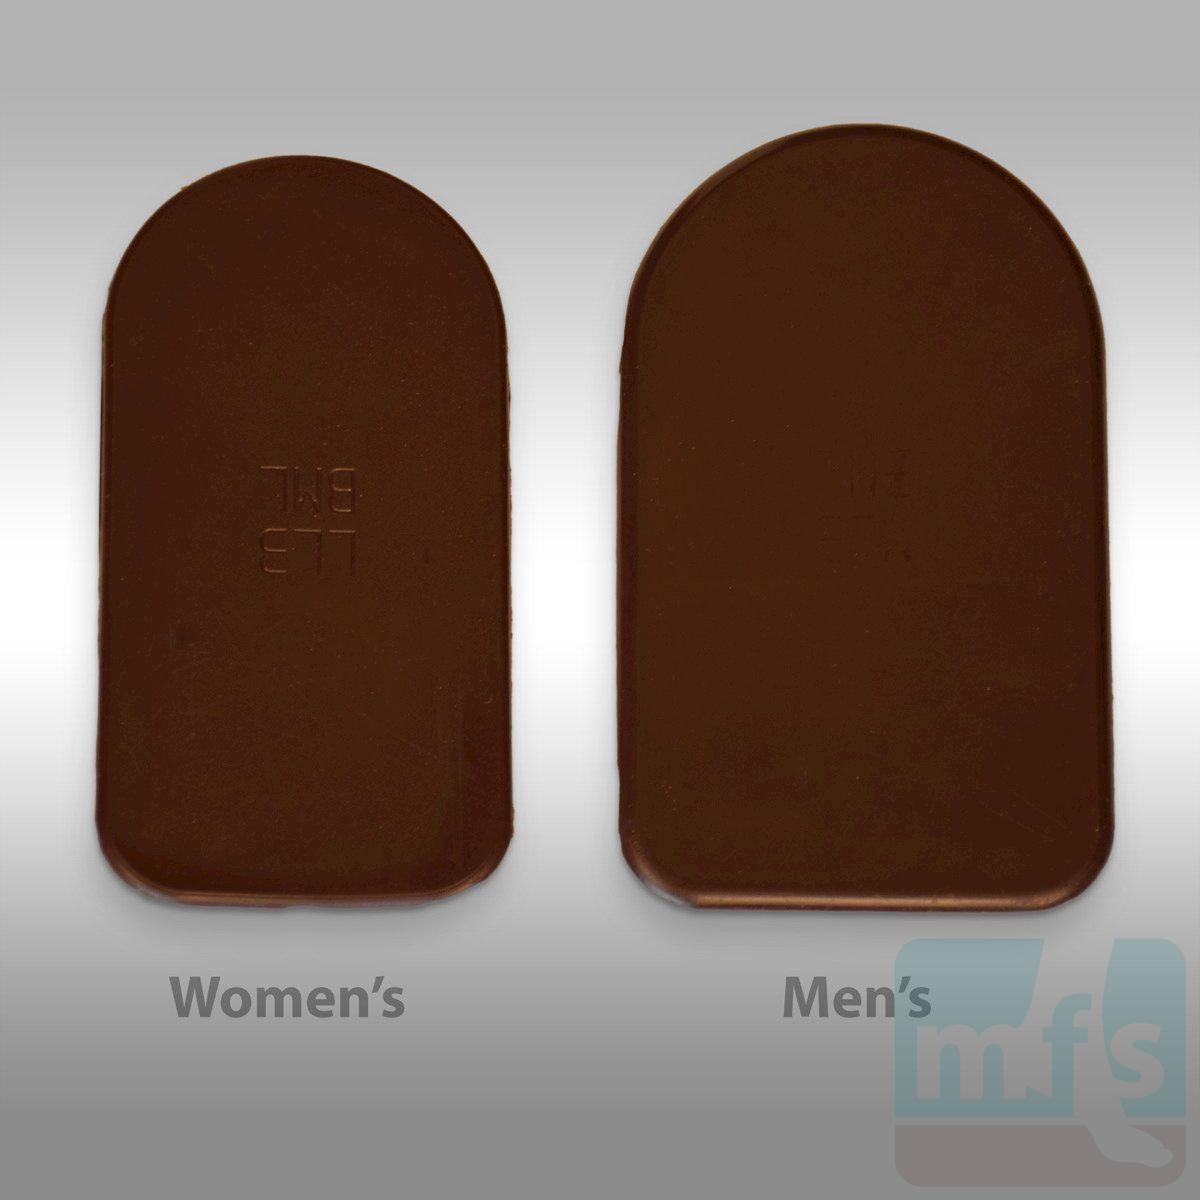 Mm Shoe Lift For Men Rubber